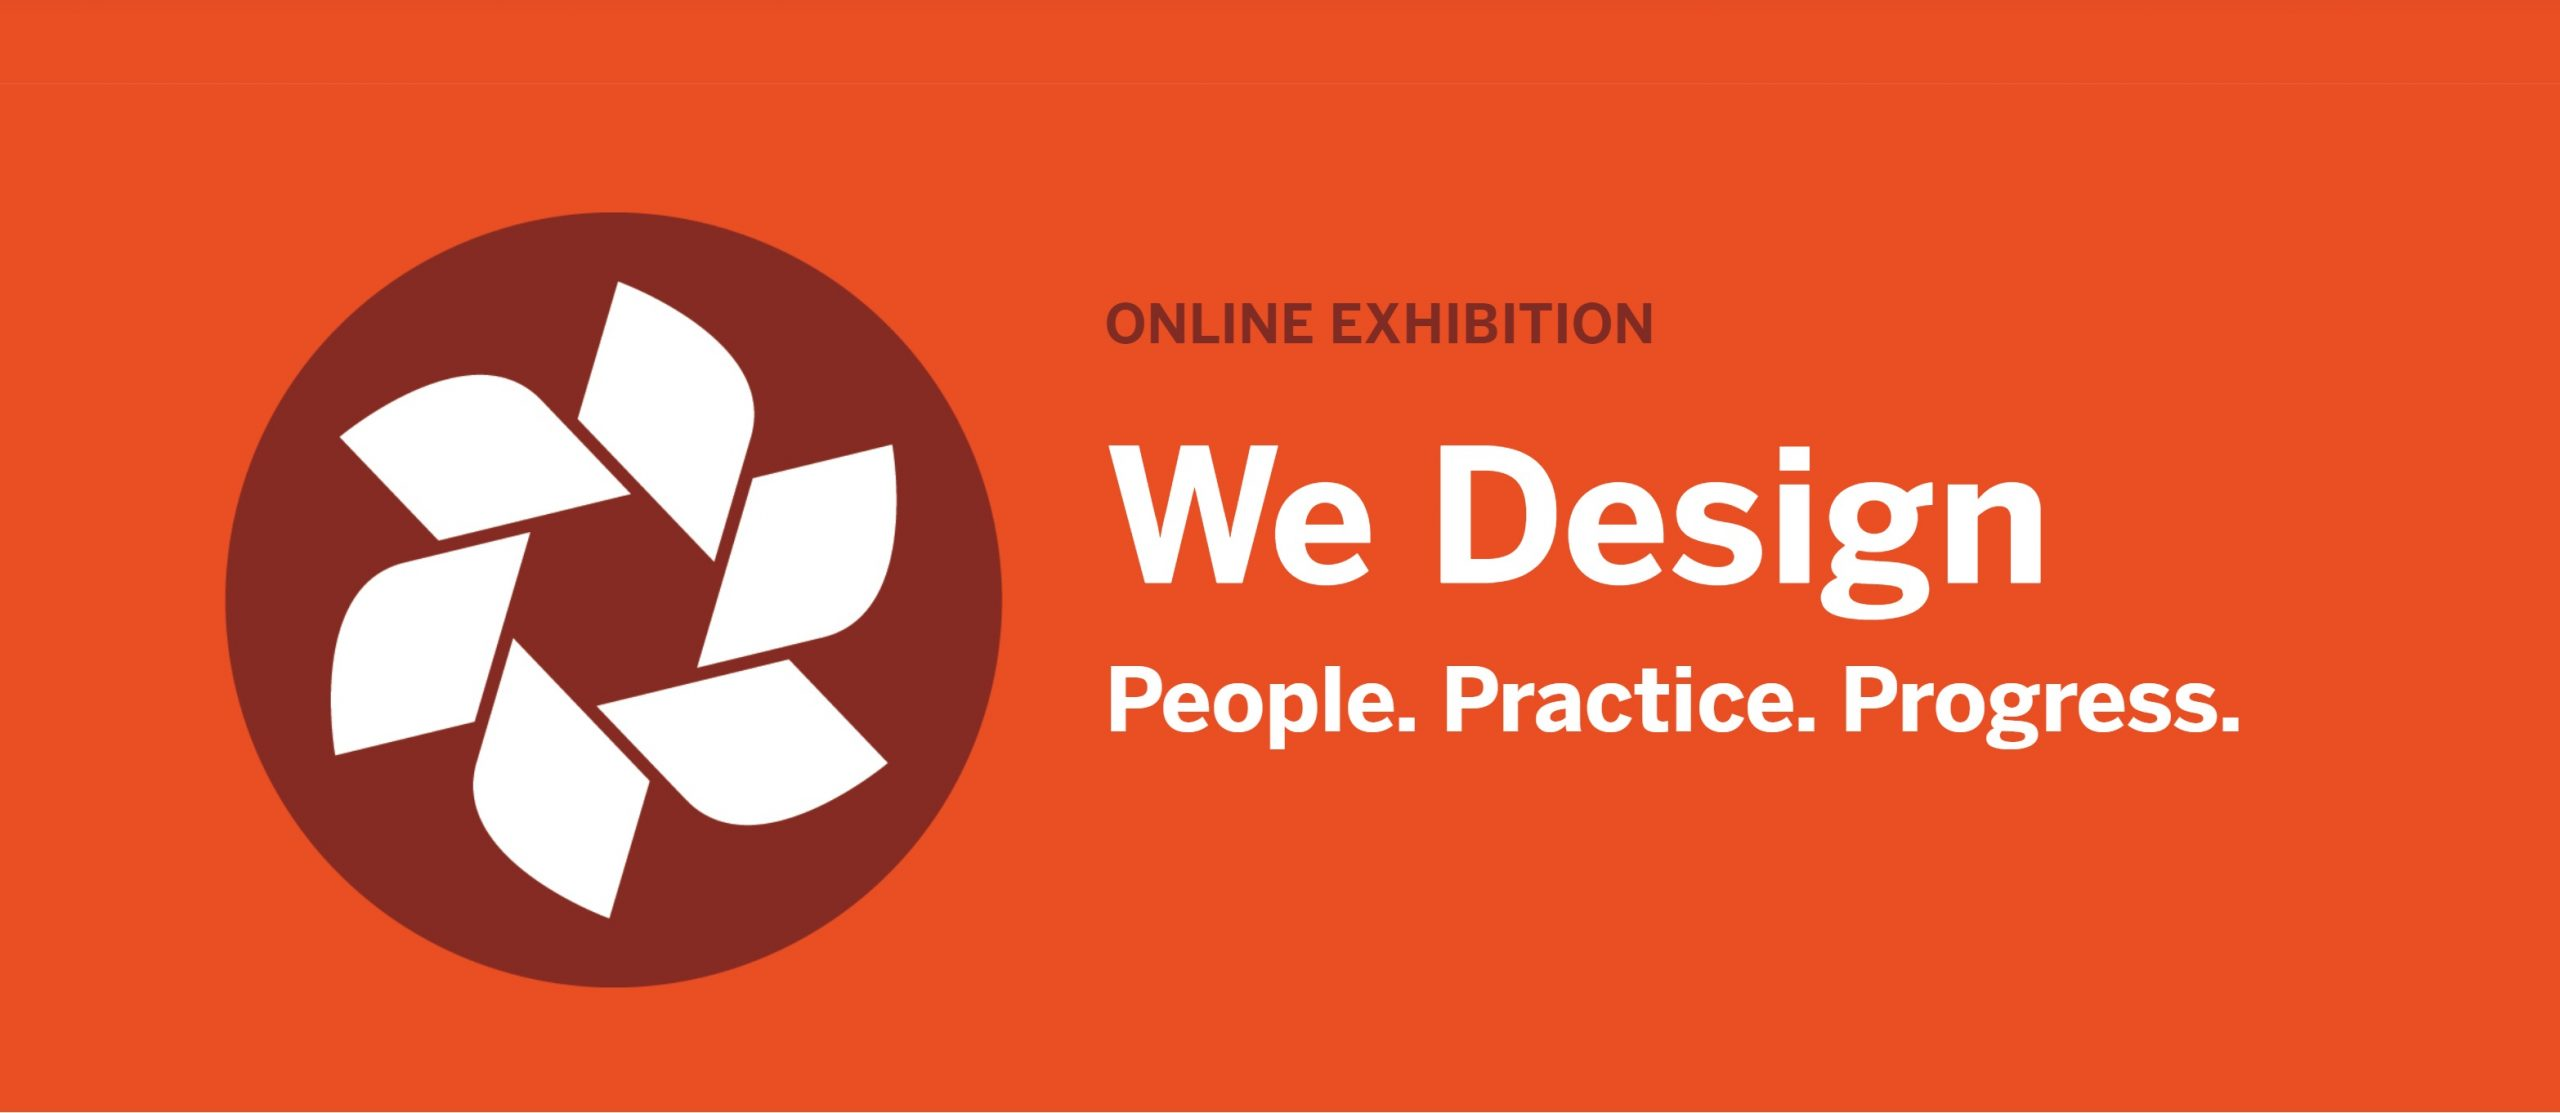 We Design People